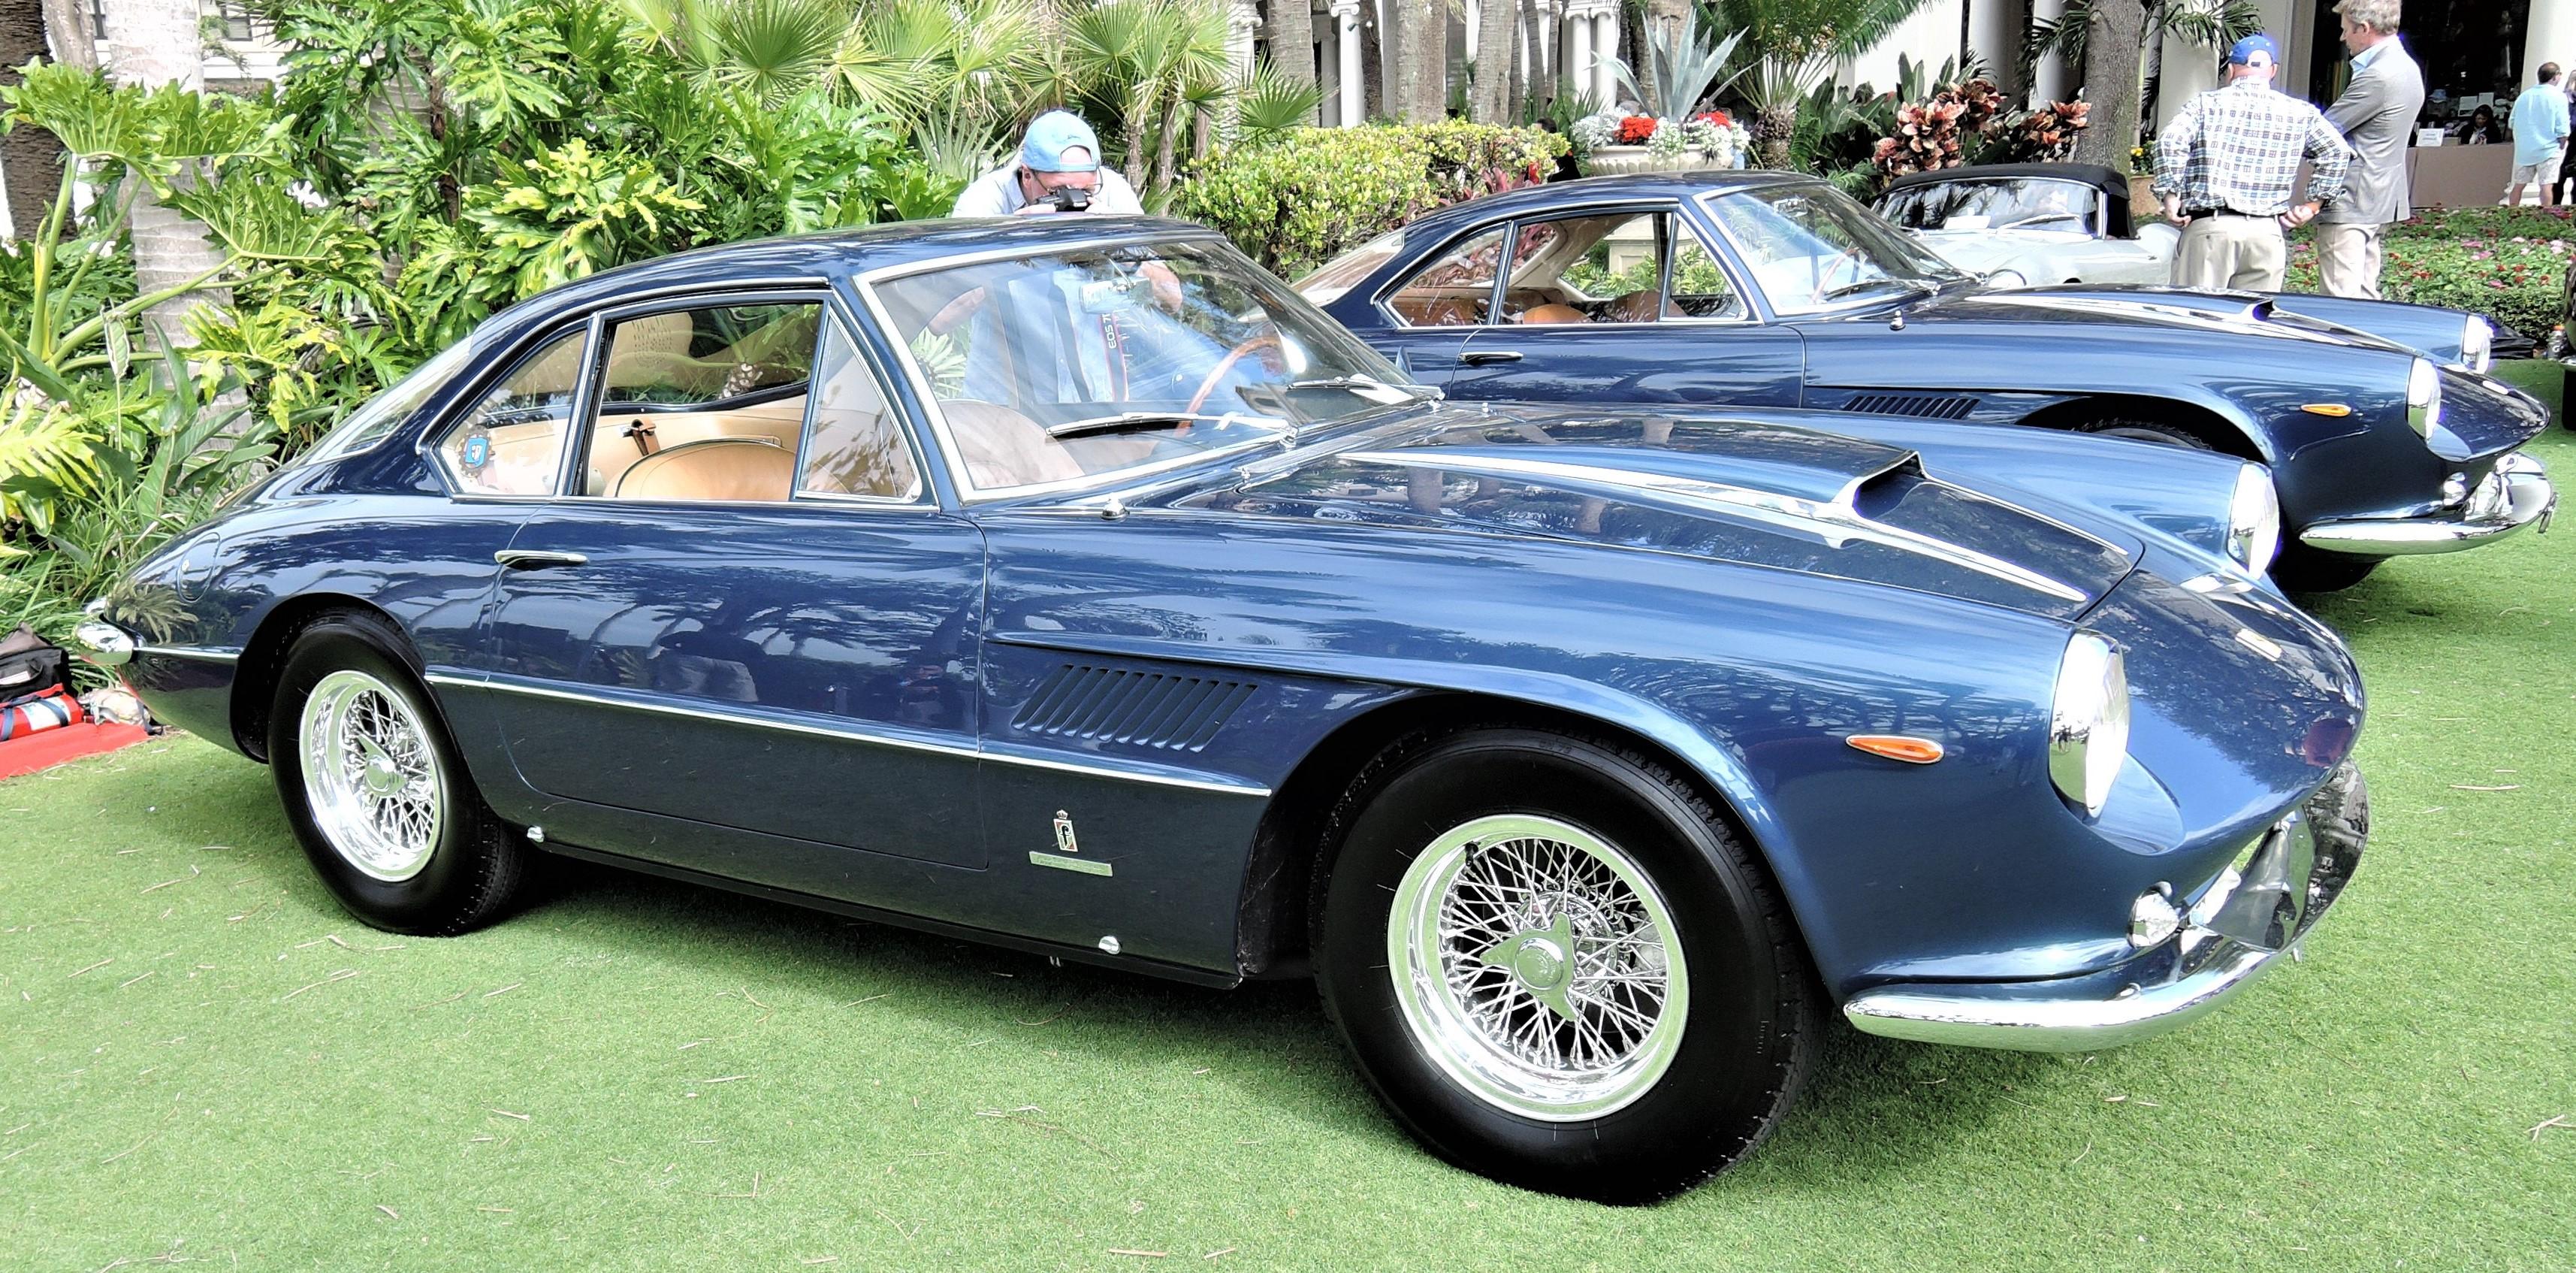 blue 1962 Ferrari 400 SA Aerodinamico; Sn 3361 SA - Cavallino 2018 Concours